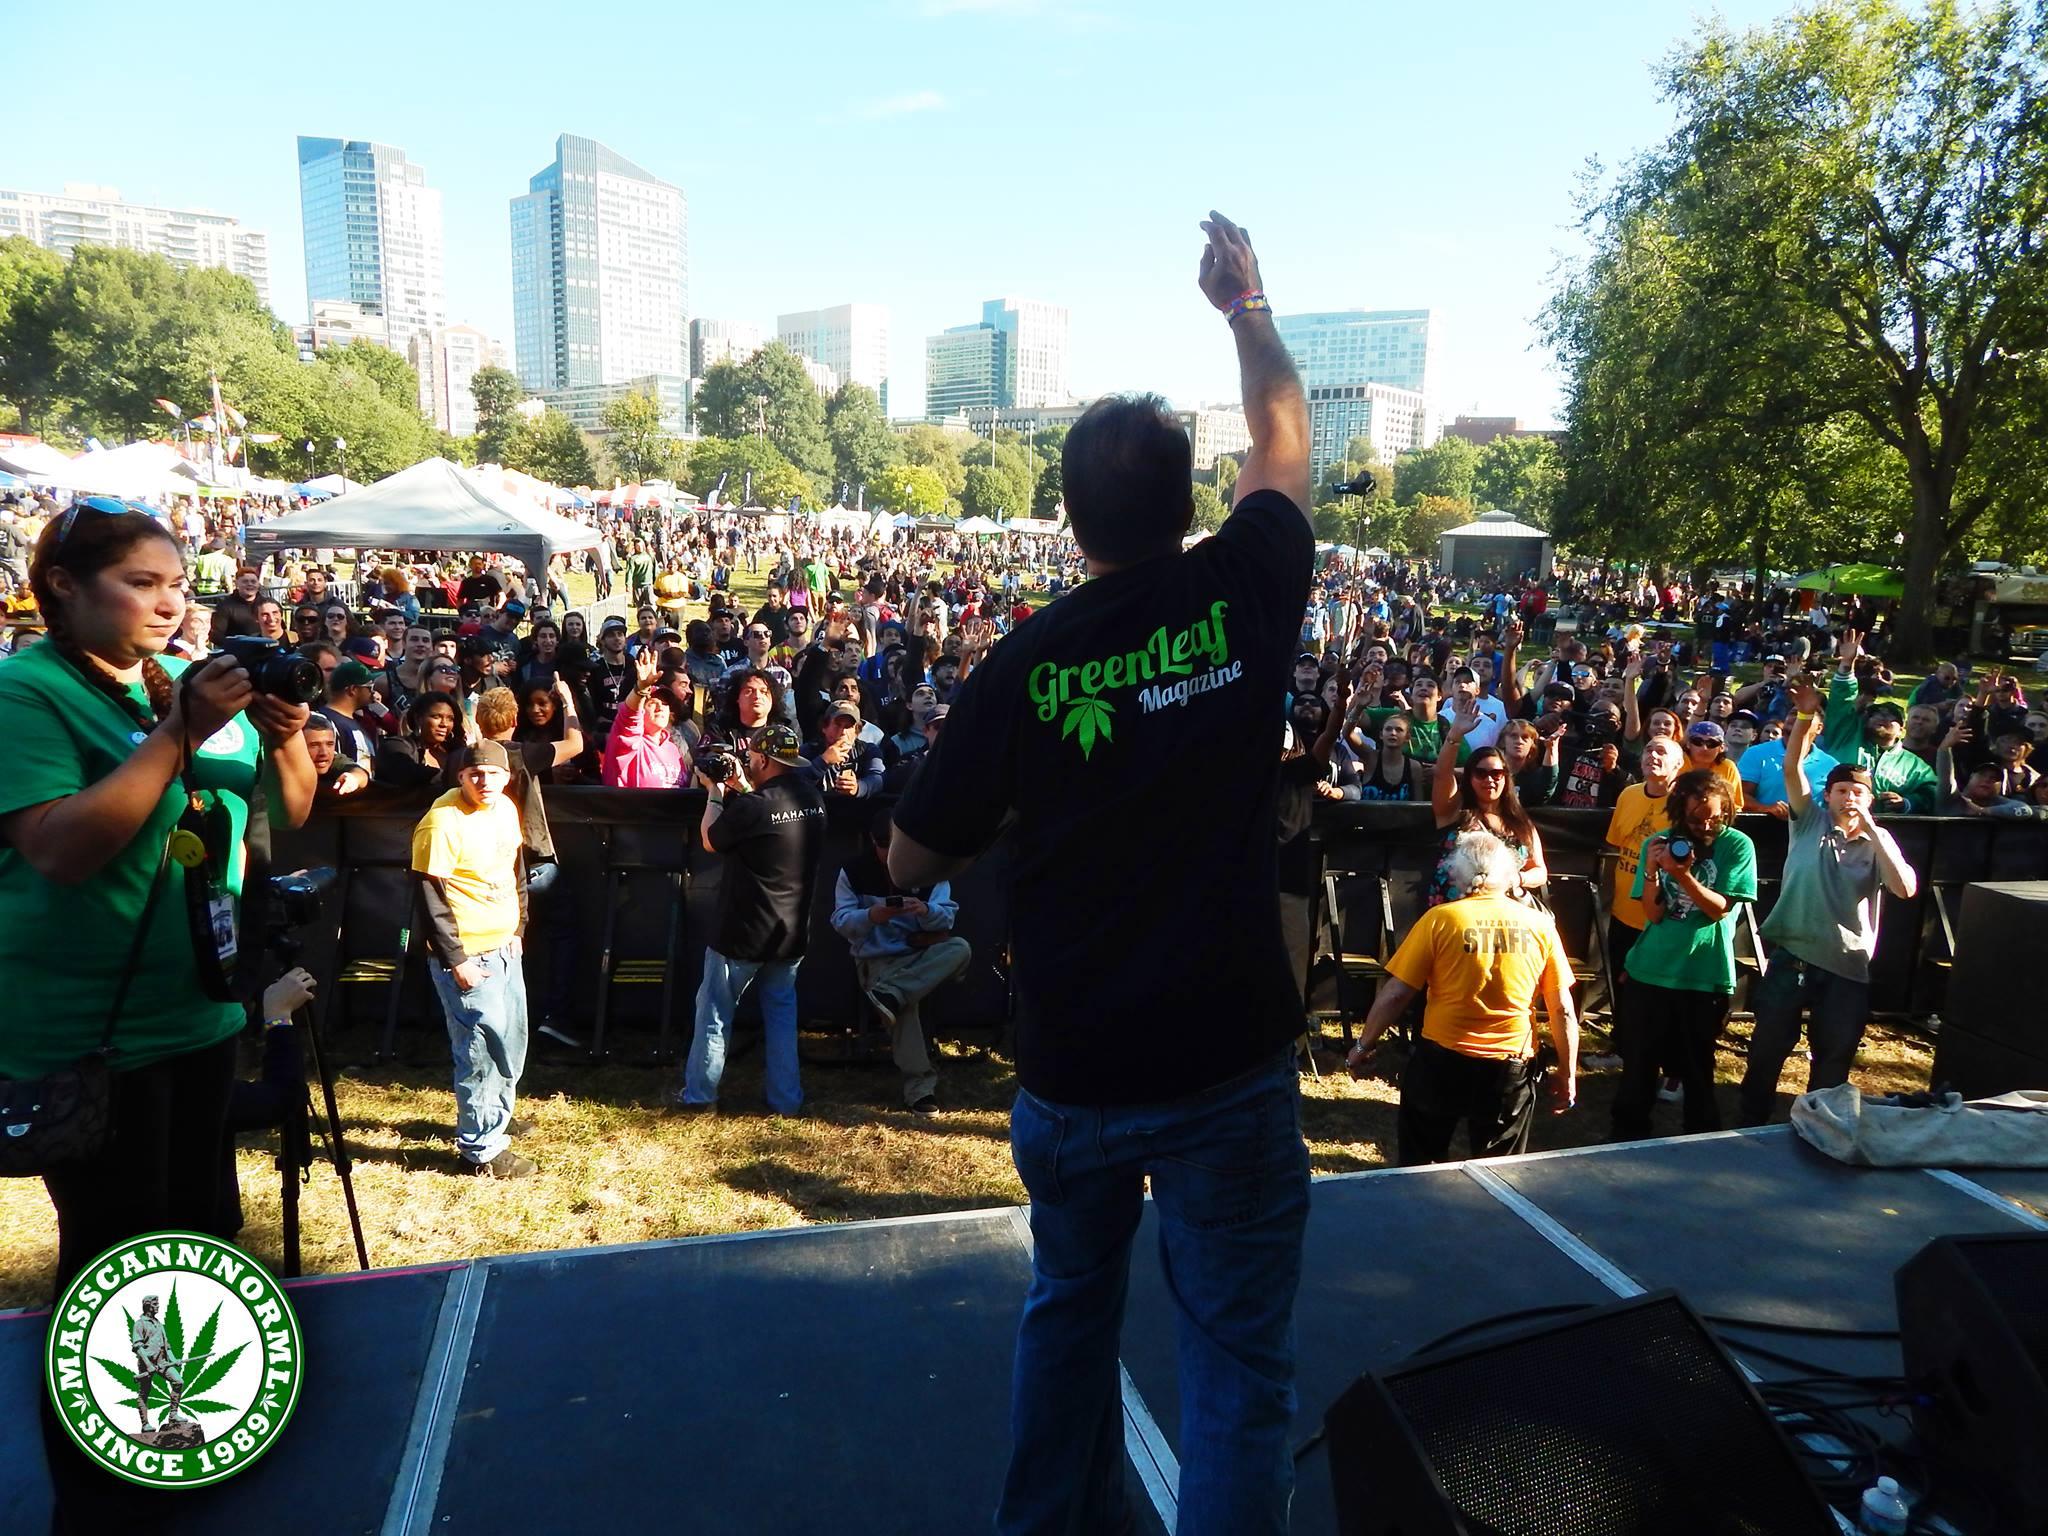 Boston Freedom Rally